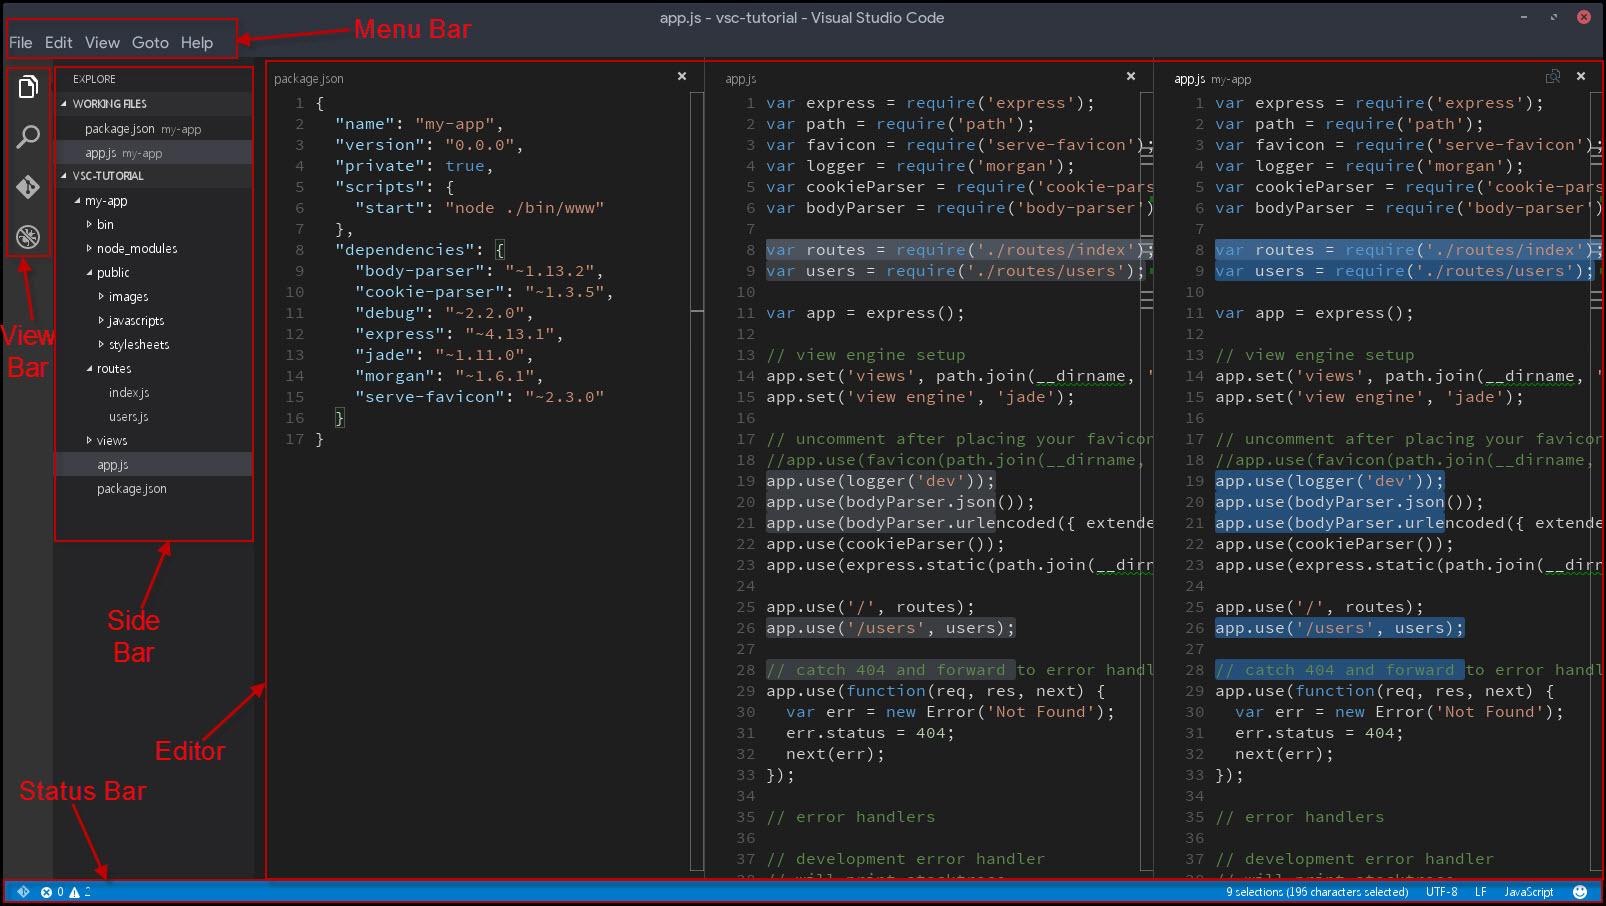 1-user interface of visual studio code